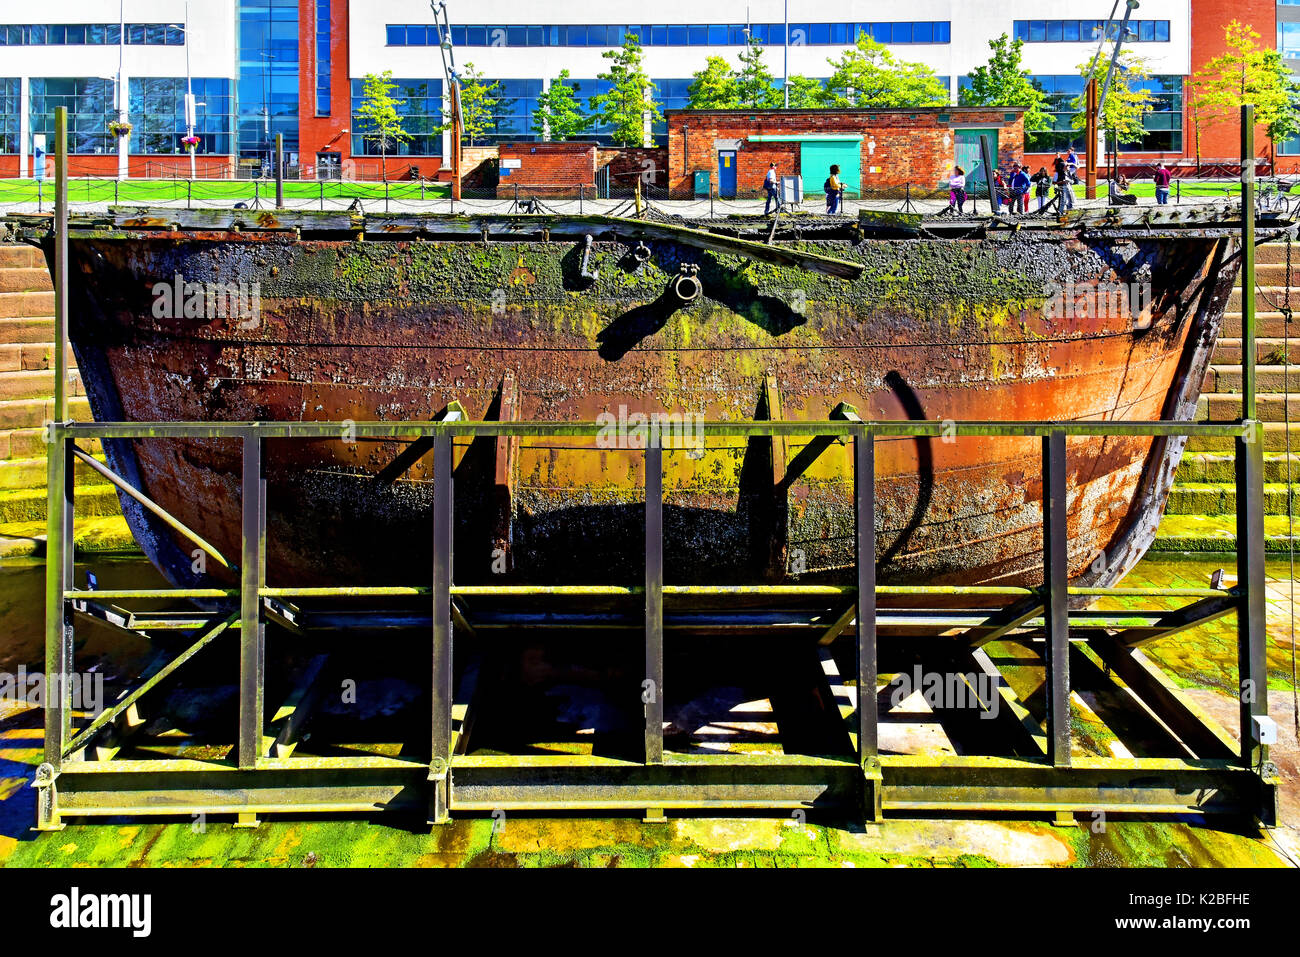 Belfast Northern Ireland Titanic Museum Hamilton dock Caisson - Stock Image